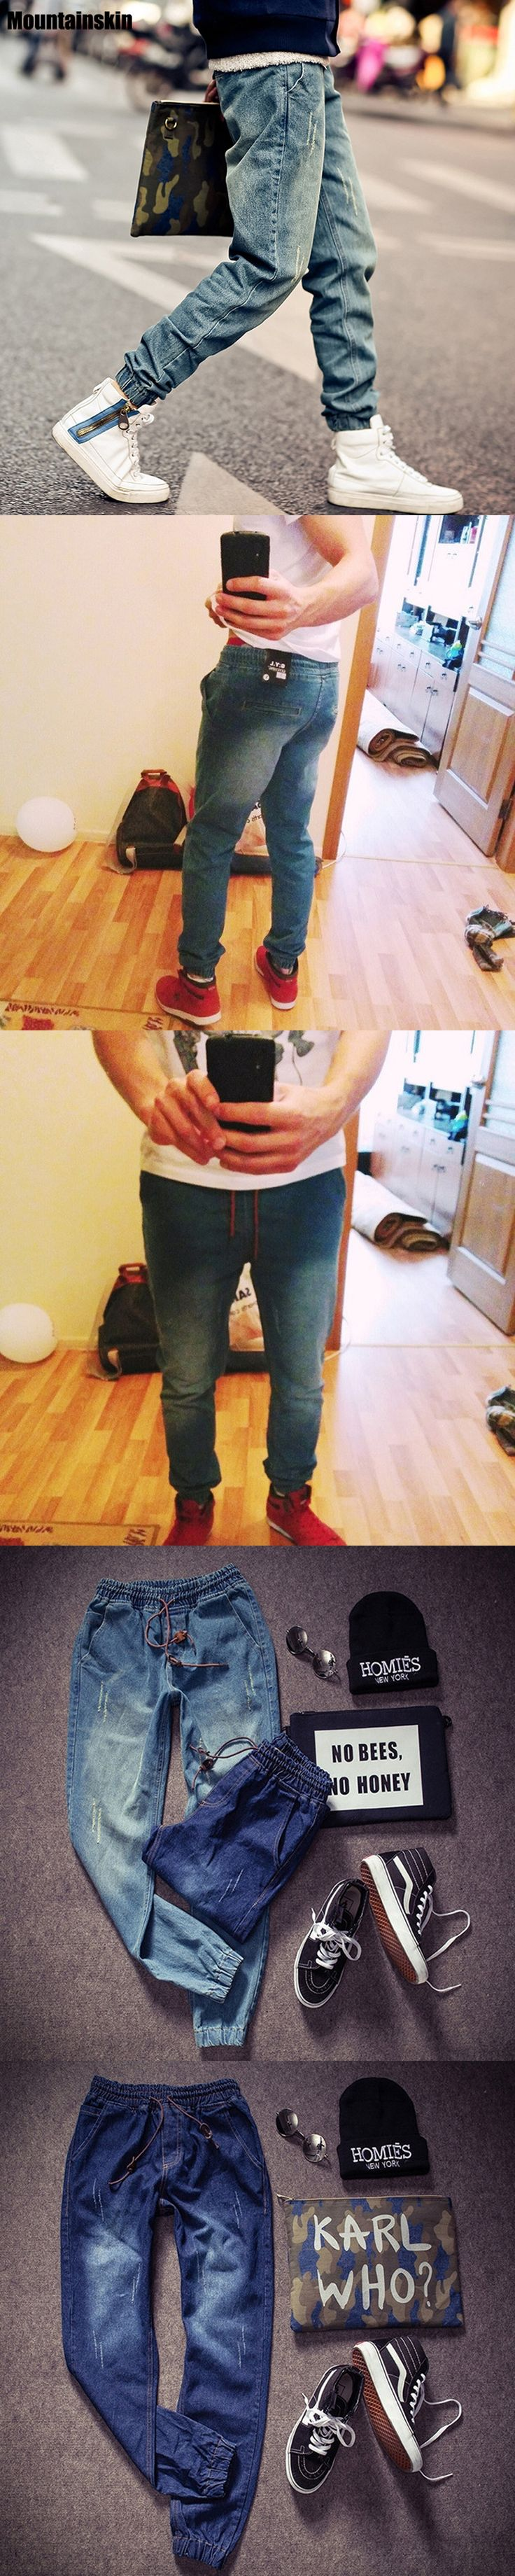 Mountainskin New Korean Style Men's Jeans Distrressed Jogger Jeans Slim Fit Denim Pants Skinny Stretch Elastic Jeans ,JA265